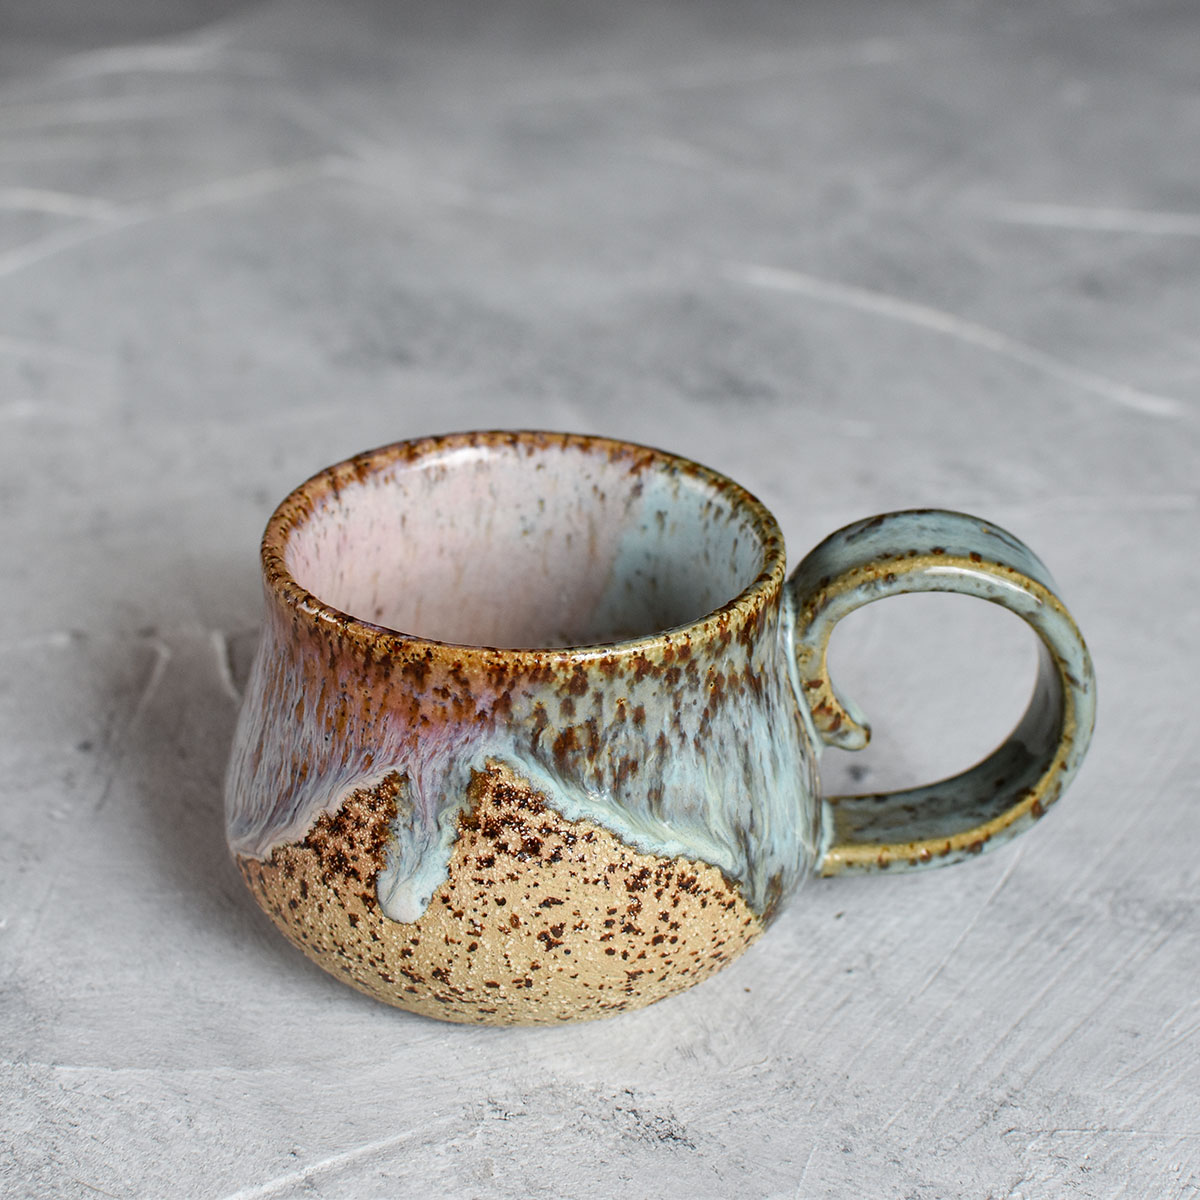 картинка Маленькая чашка Виктории Юрьевой 7 - DishWishes.Ru